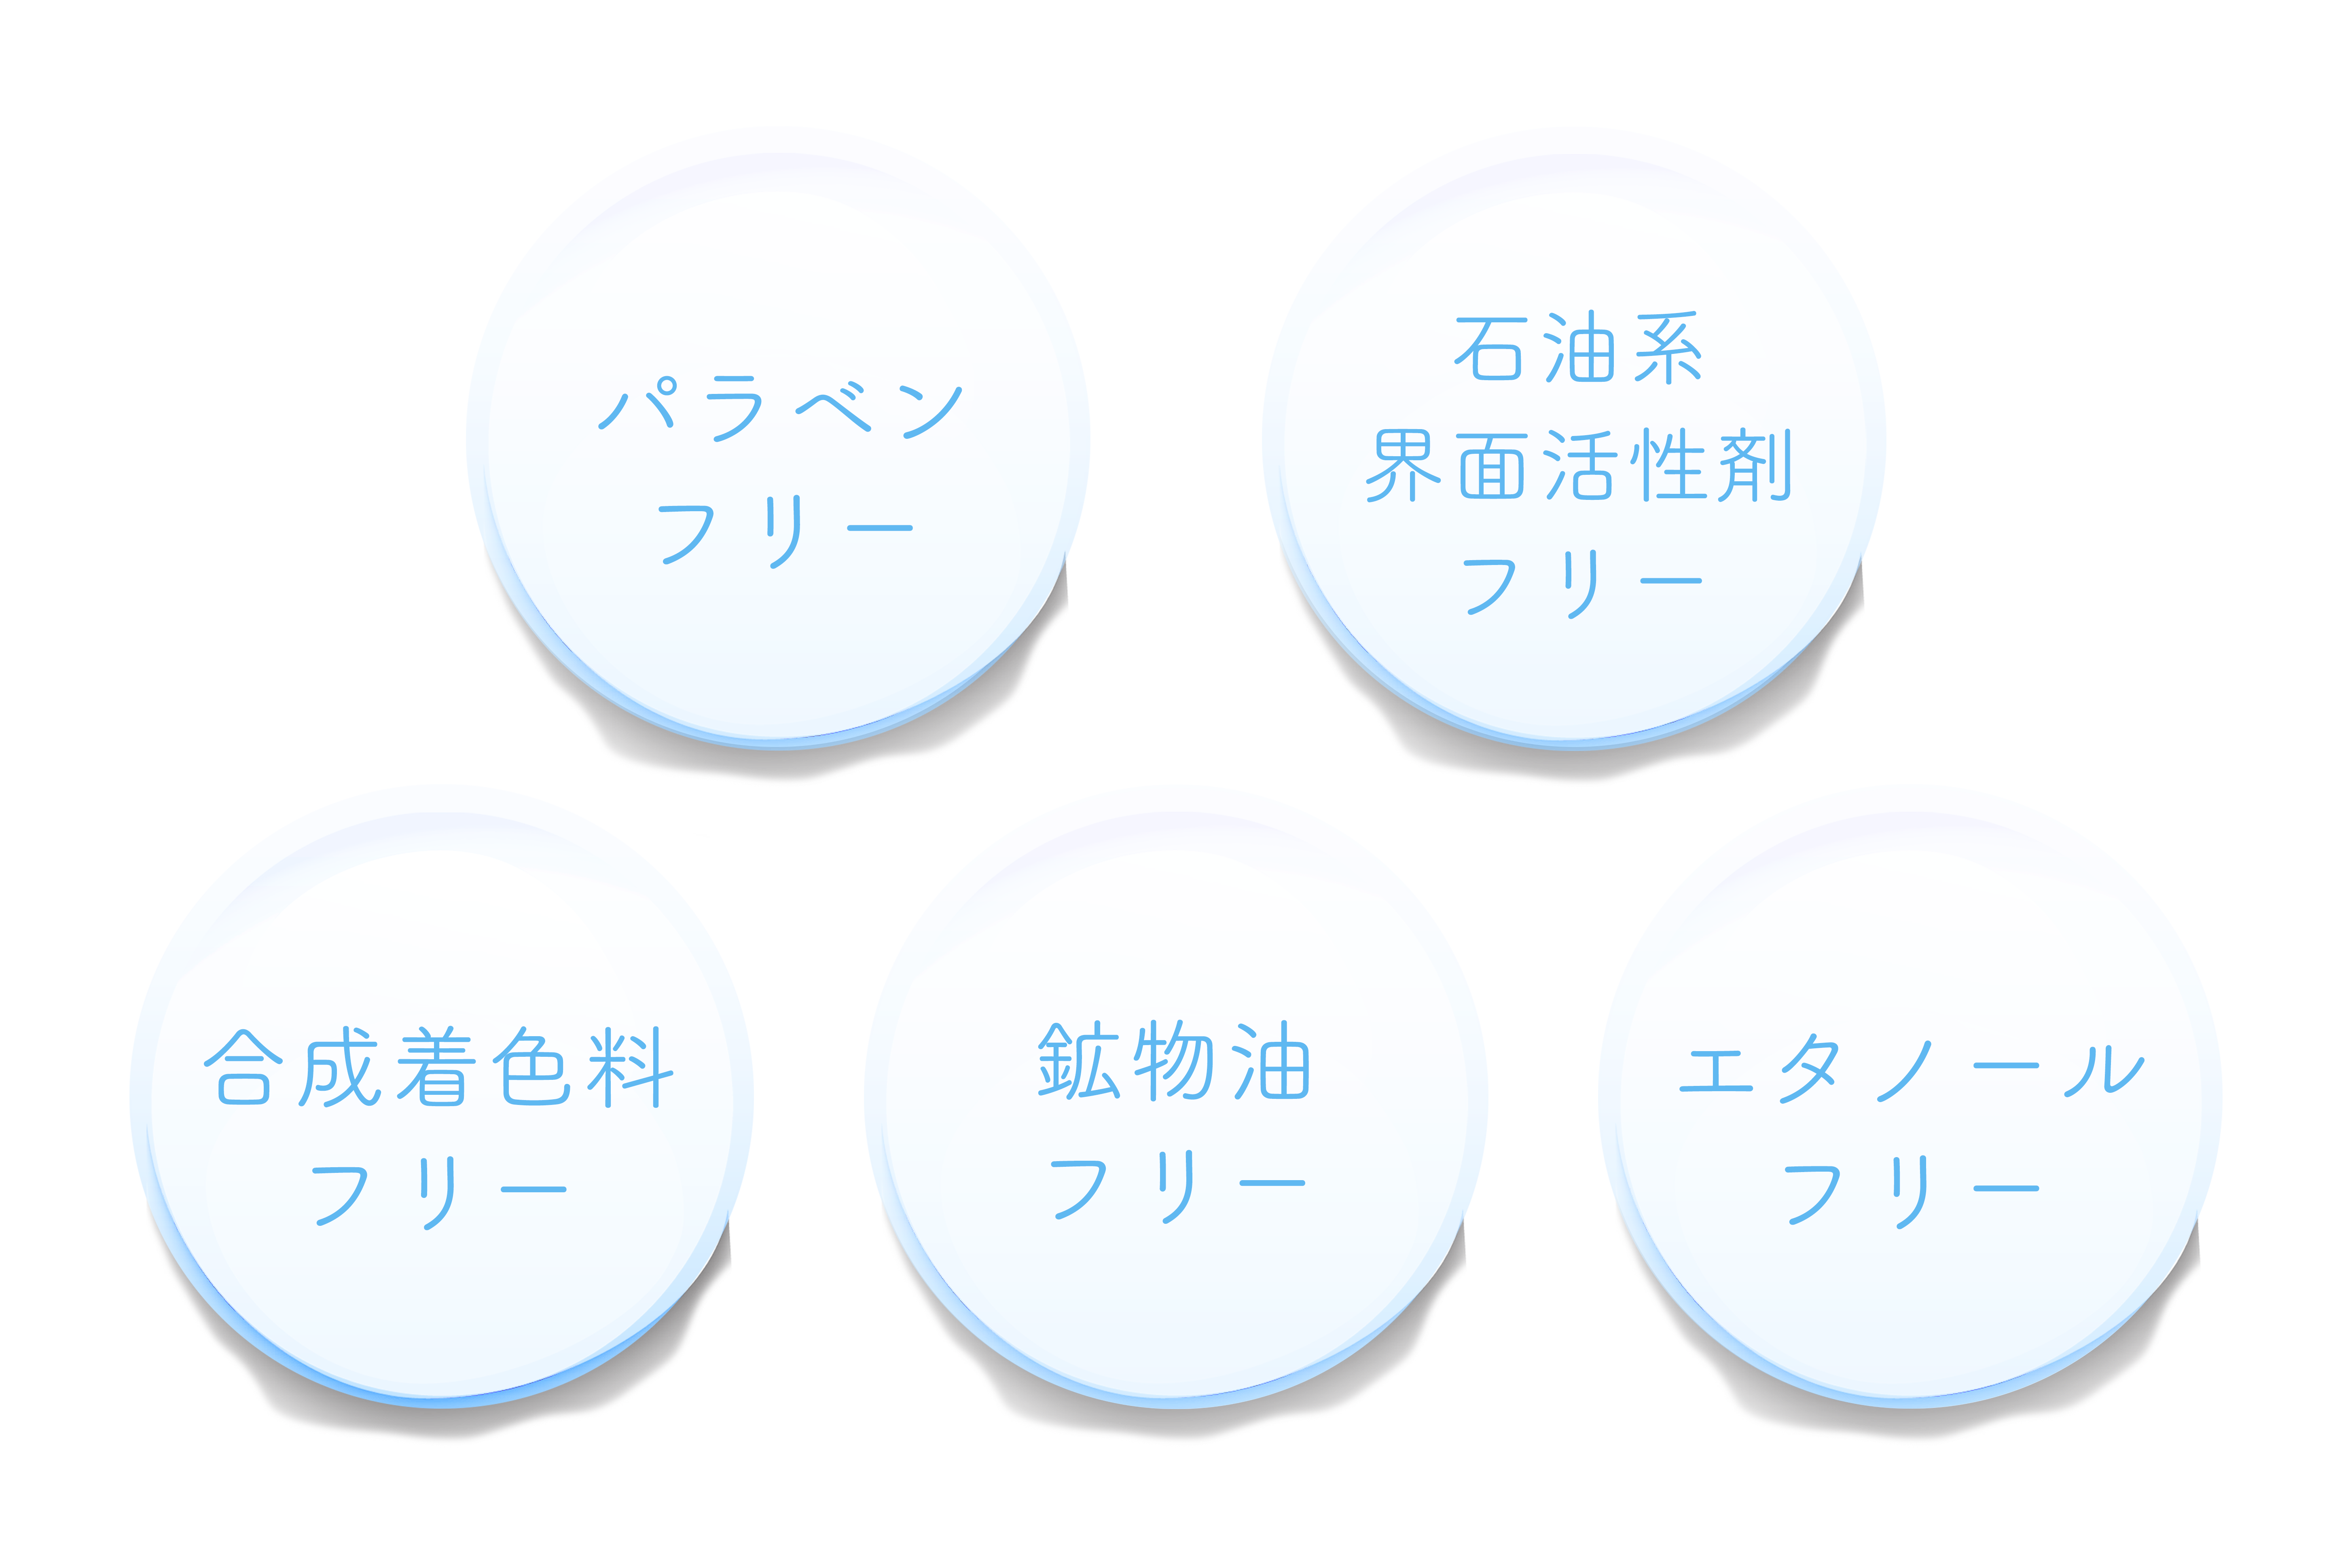 「shimaboshi ラスターリッチクリーム」で濃密なうるおいを閉じ込めた極上の水光肌へ 画像